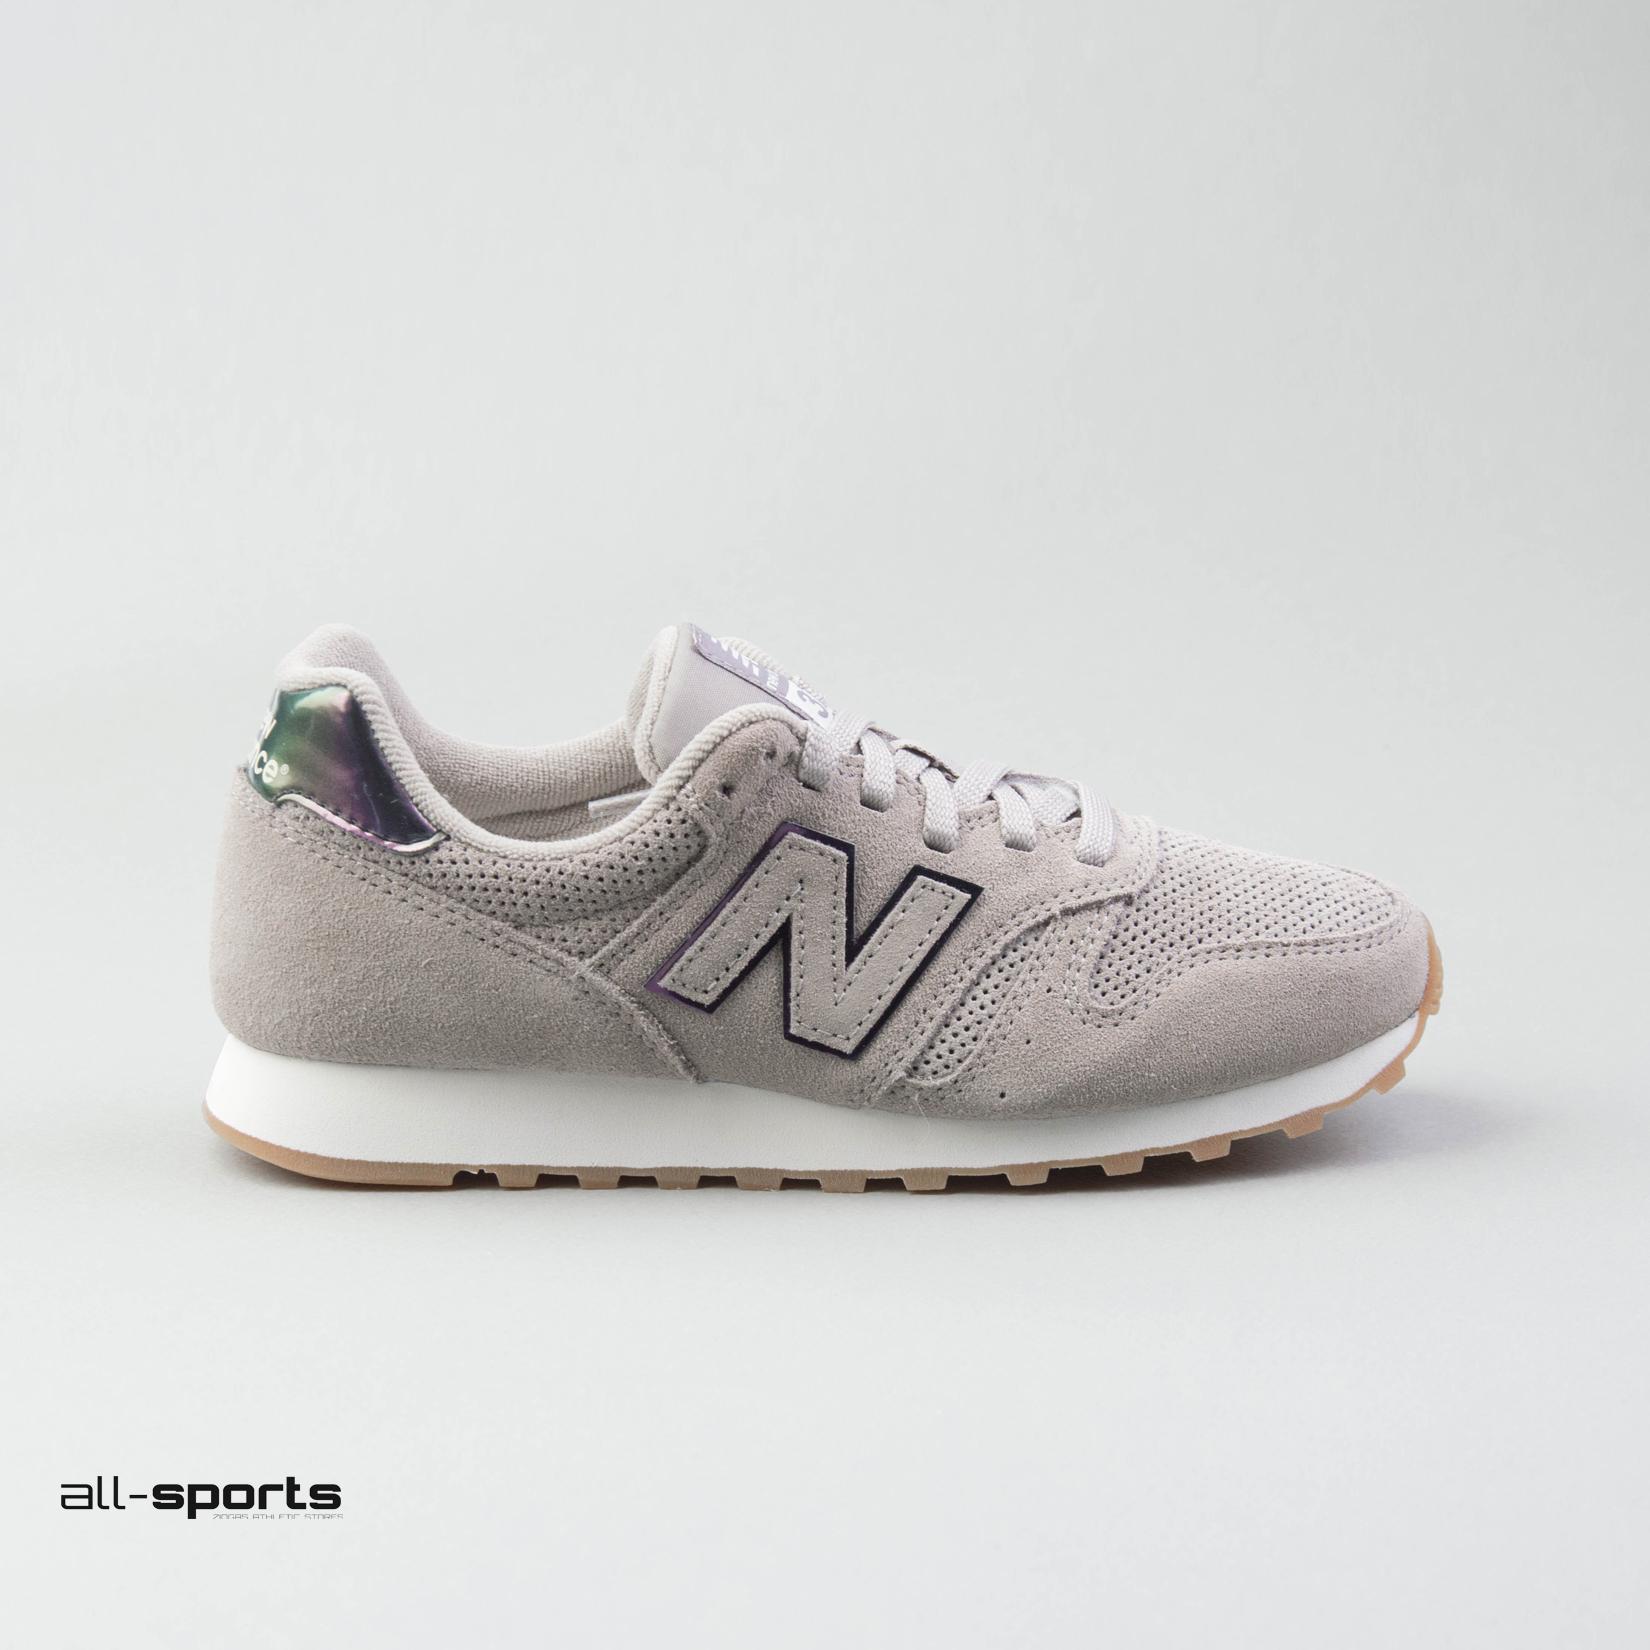 new product 5fd90 f371b Unisex Shoes New Balance 373 Modern Grey | All-Sports.gr